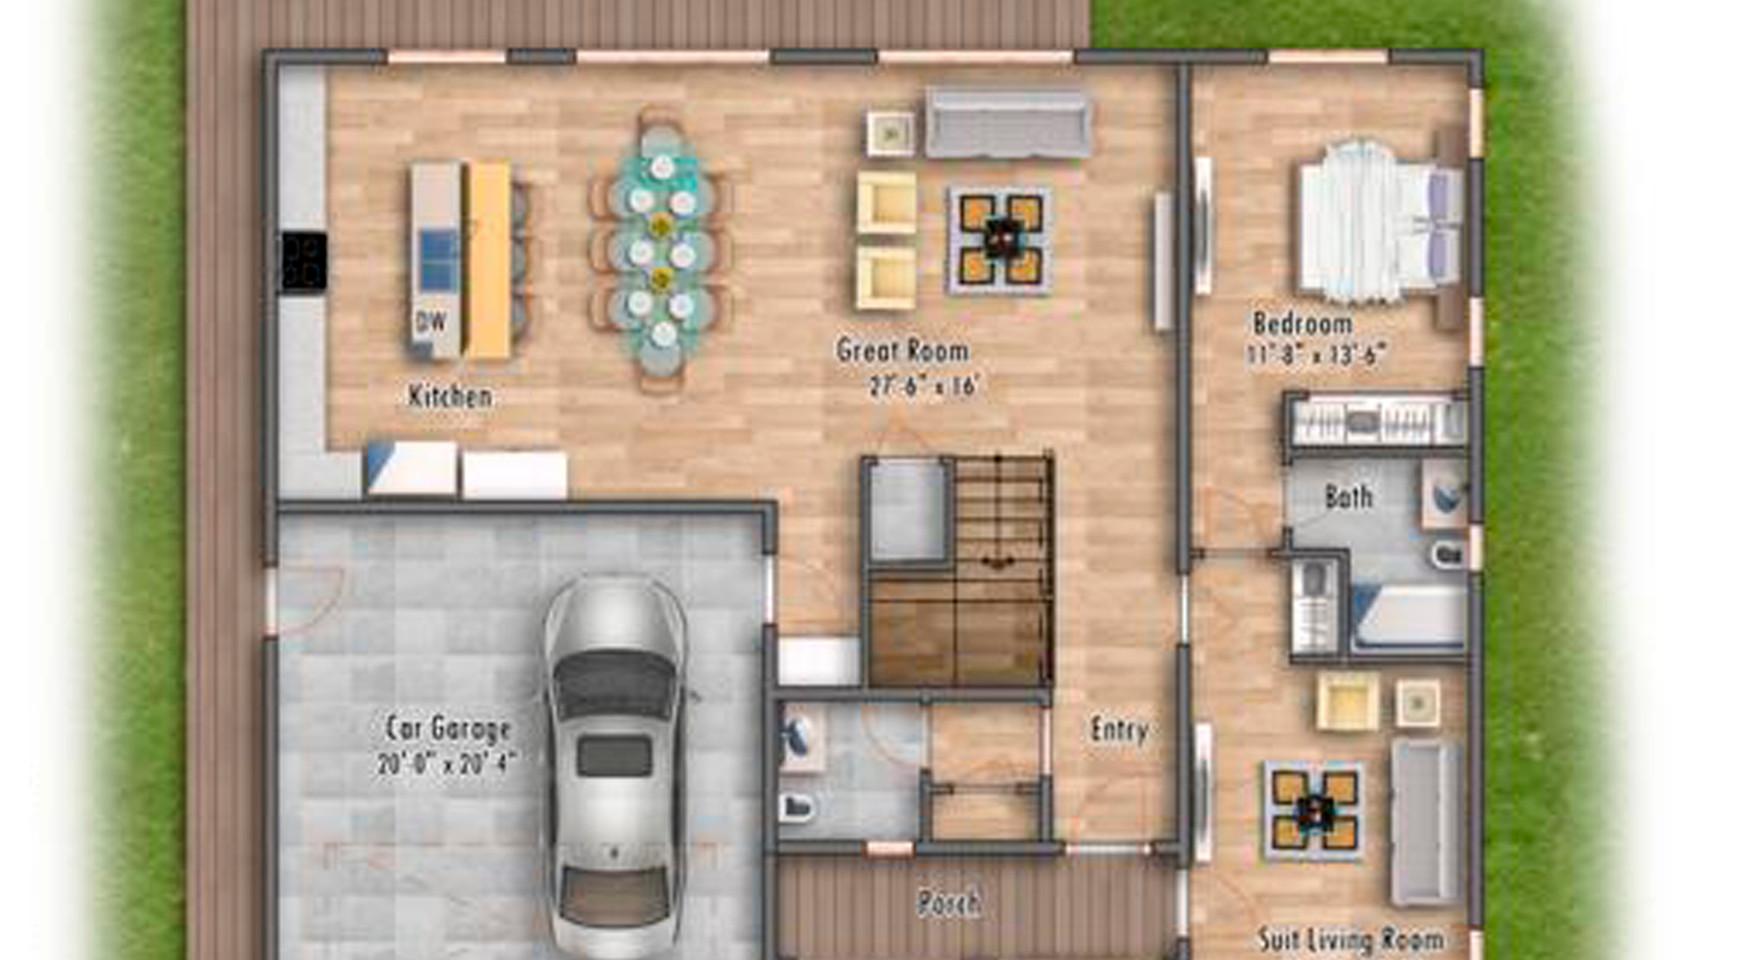 moreno valley ground floor plan.jpg